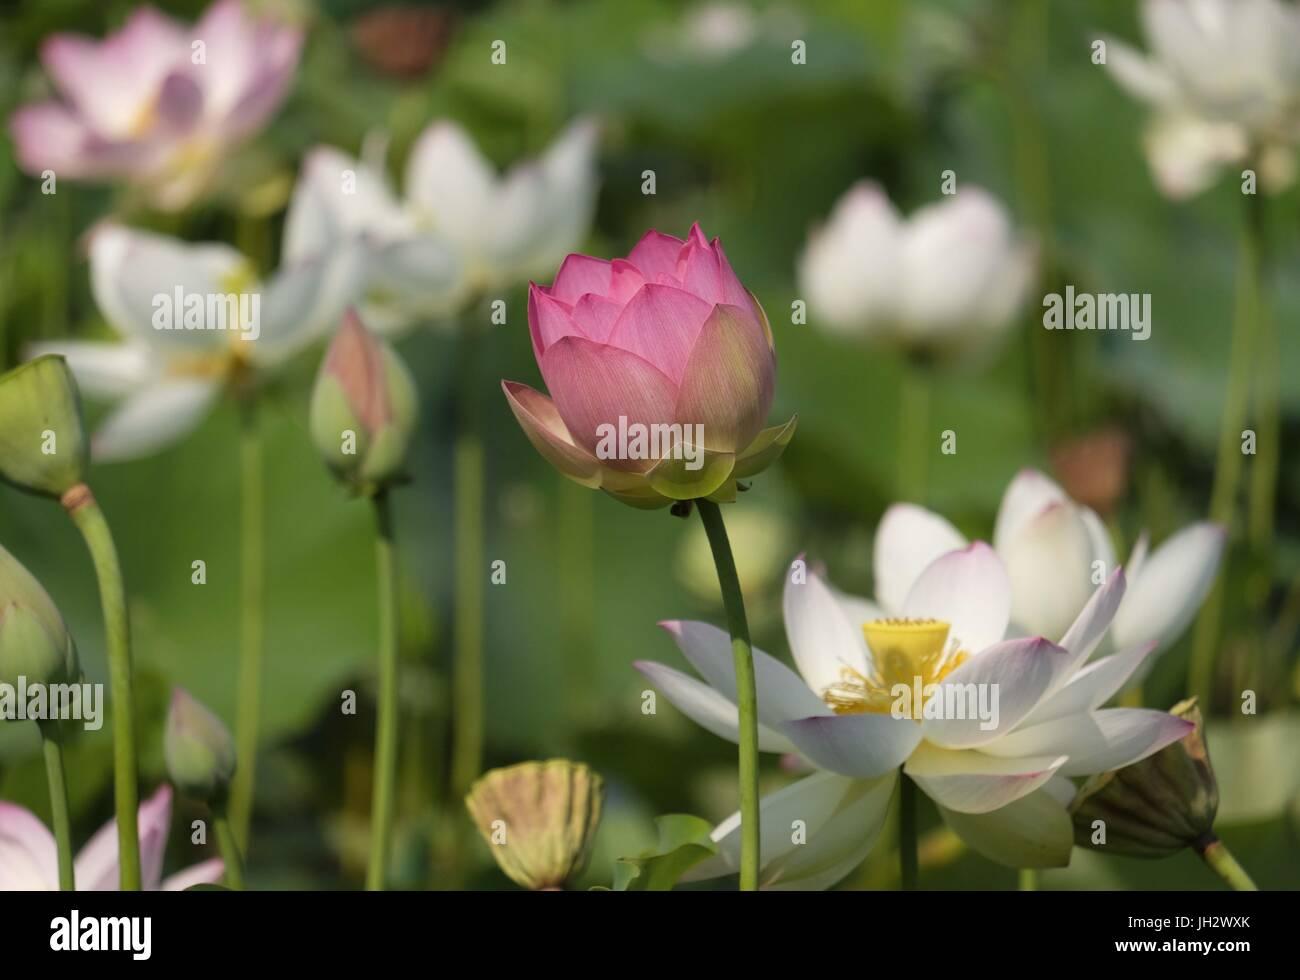 Los Angeles California Usa 12th July 2017 Lotus Flowers Blossom